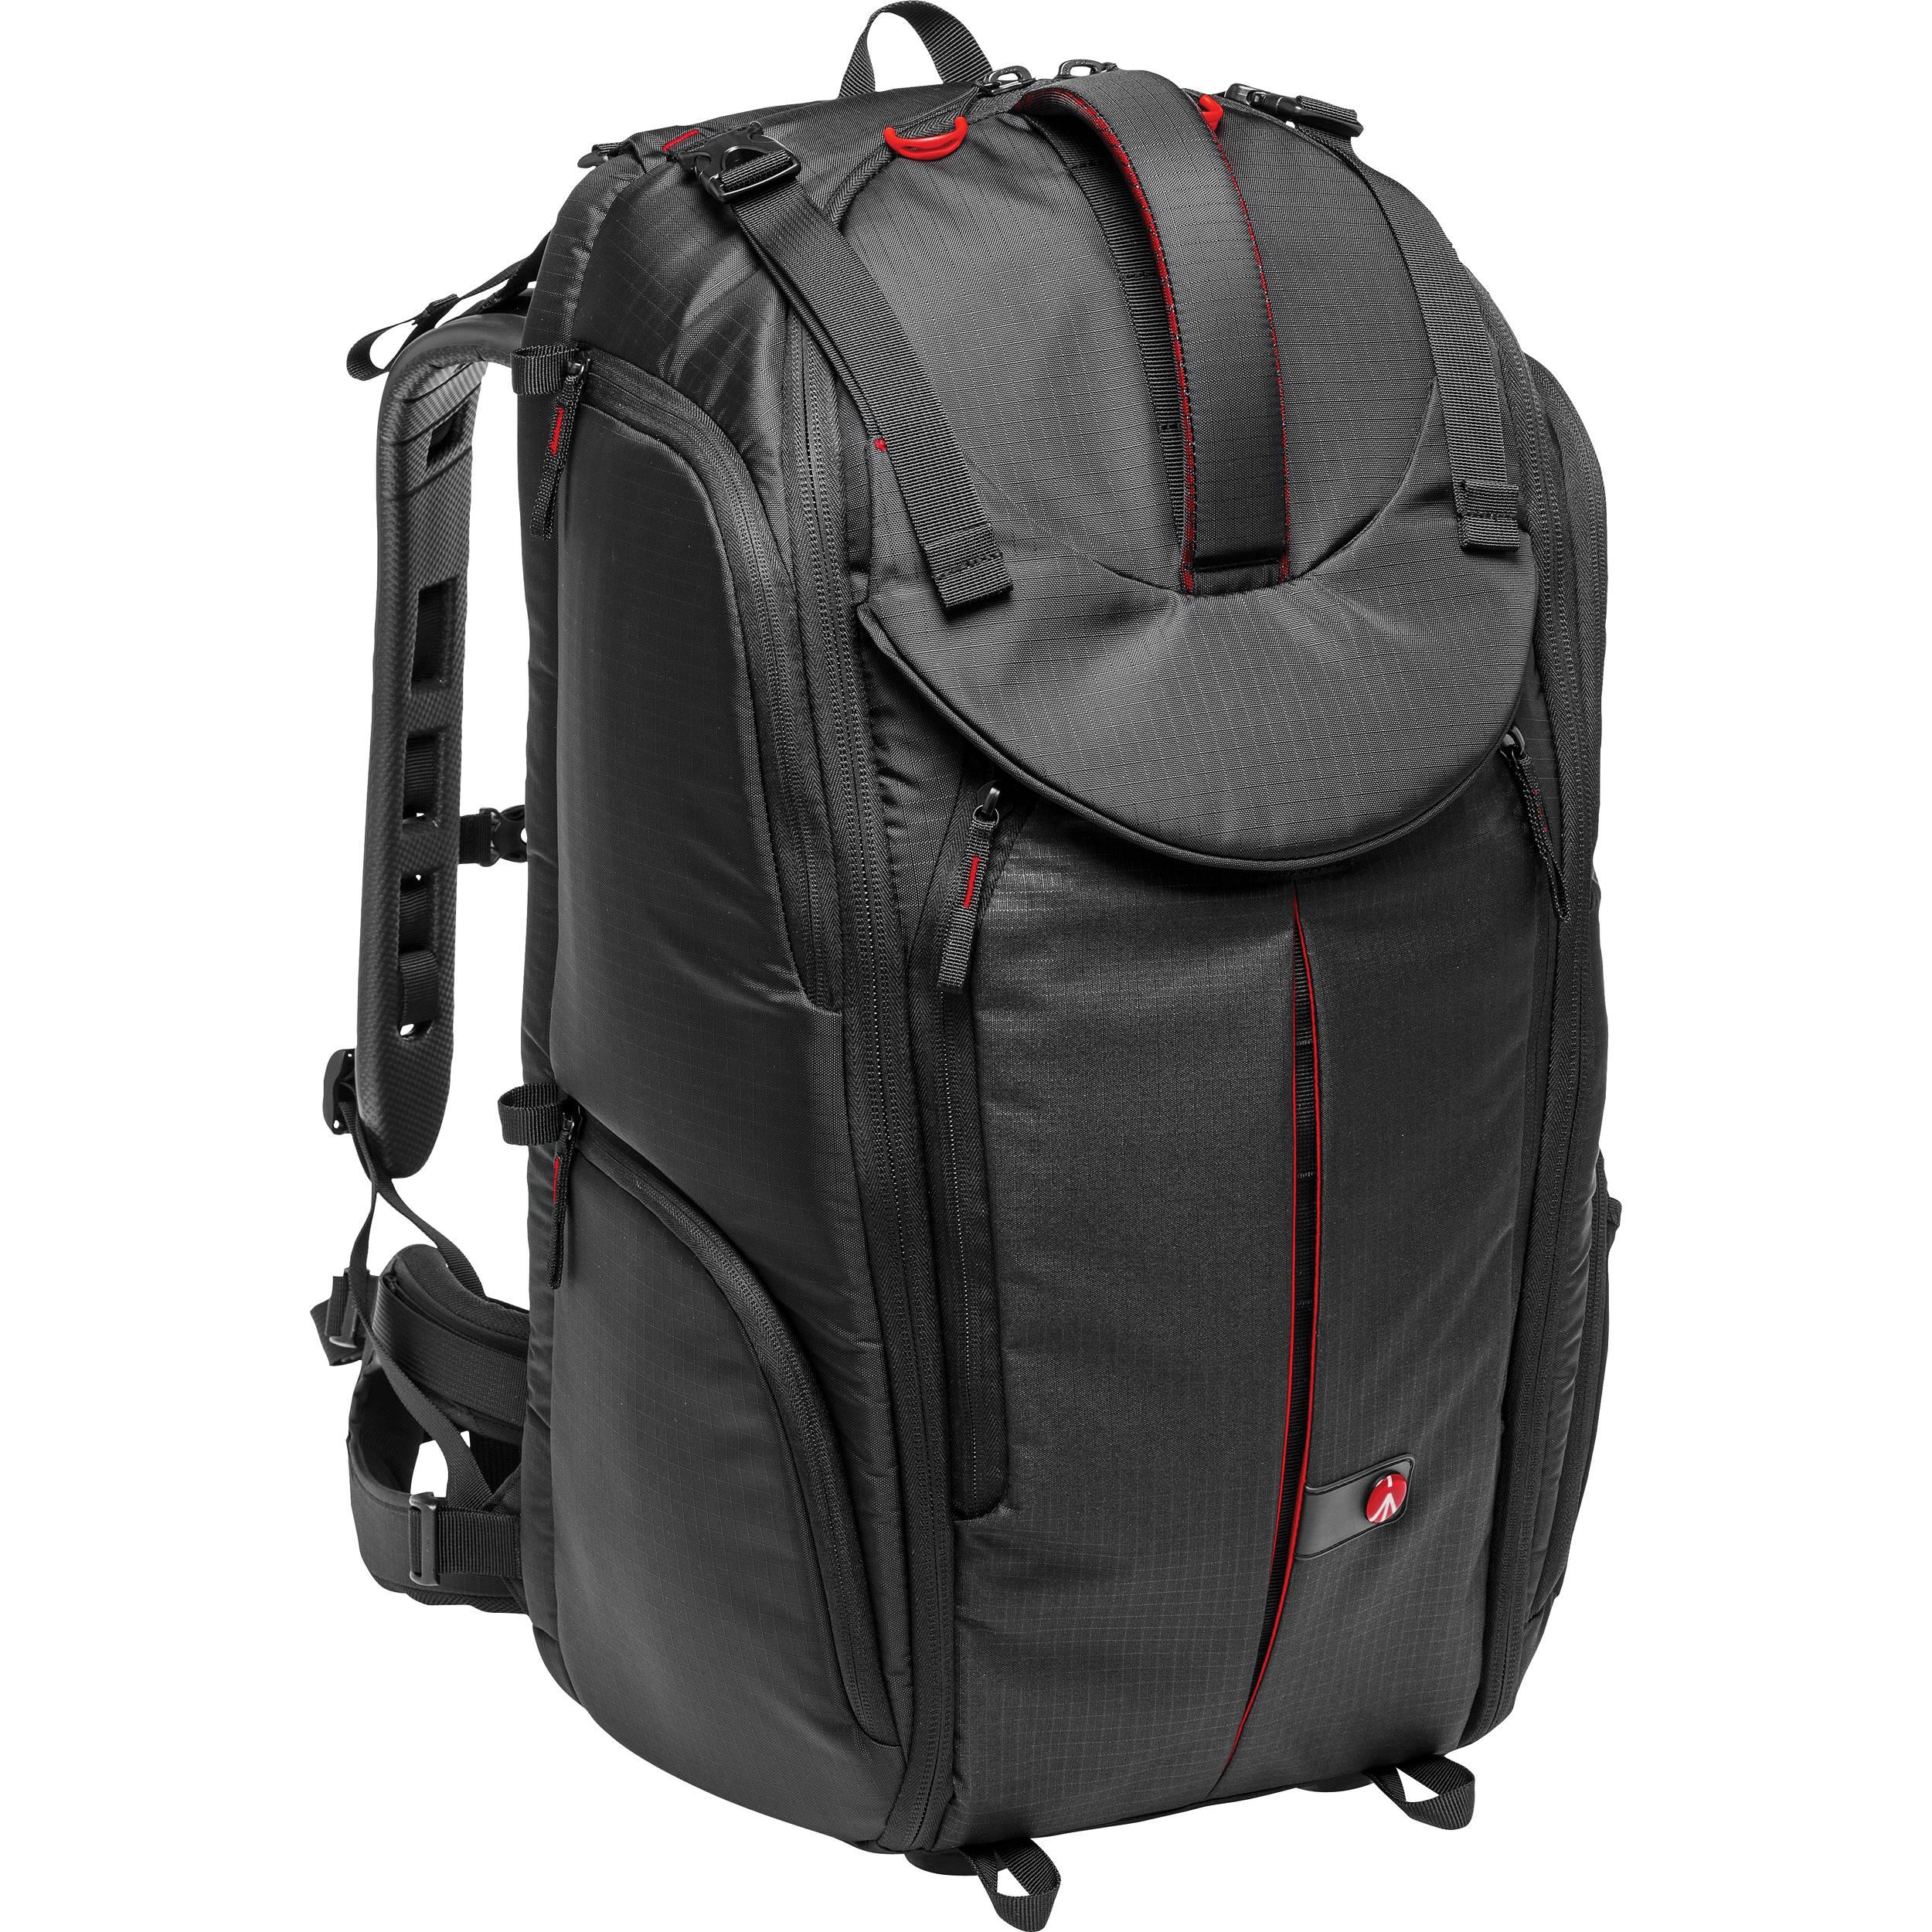 Manfrotto Pro-V-610 PL Pro-Light Video Backpack MB PL-PV-610 B&H